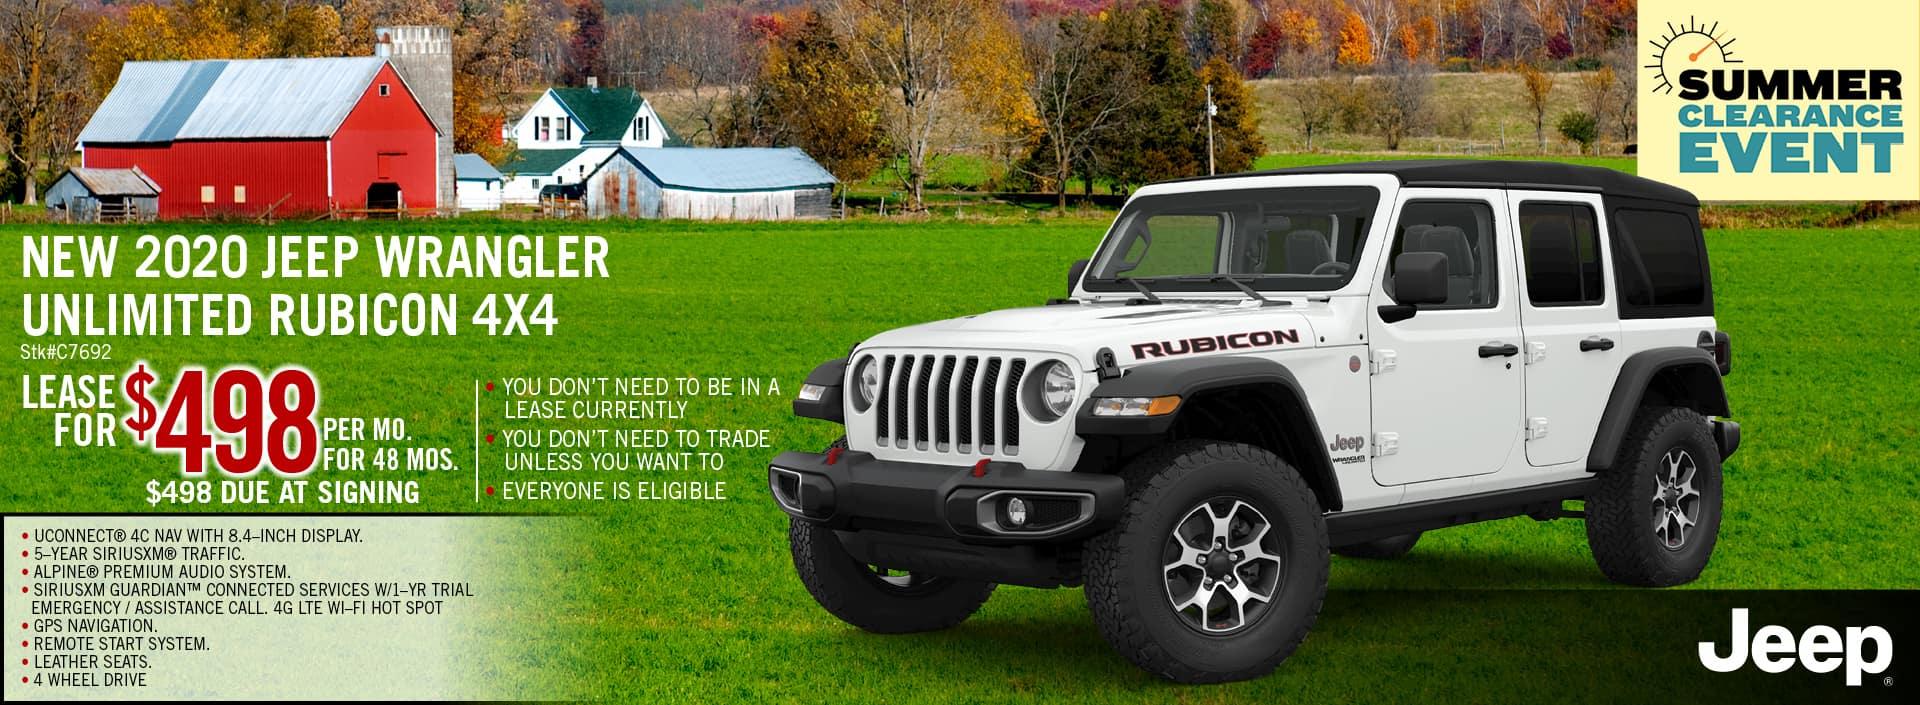 2020 Jeep Wrangler Lease Offer | Midstate CDJR